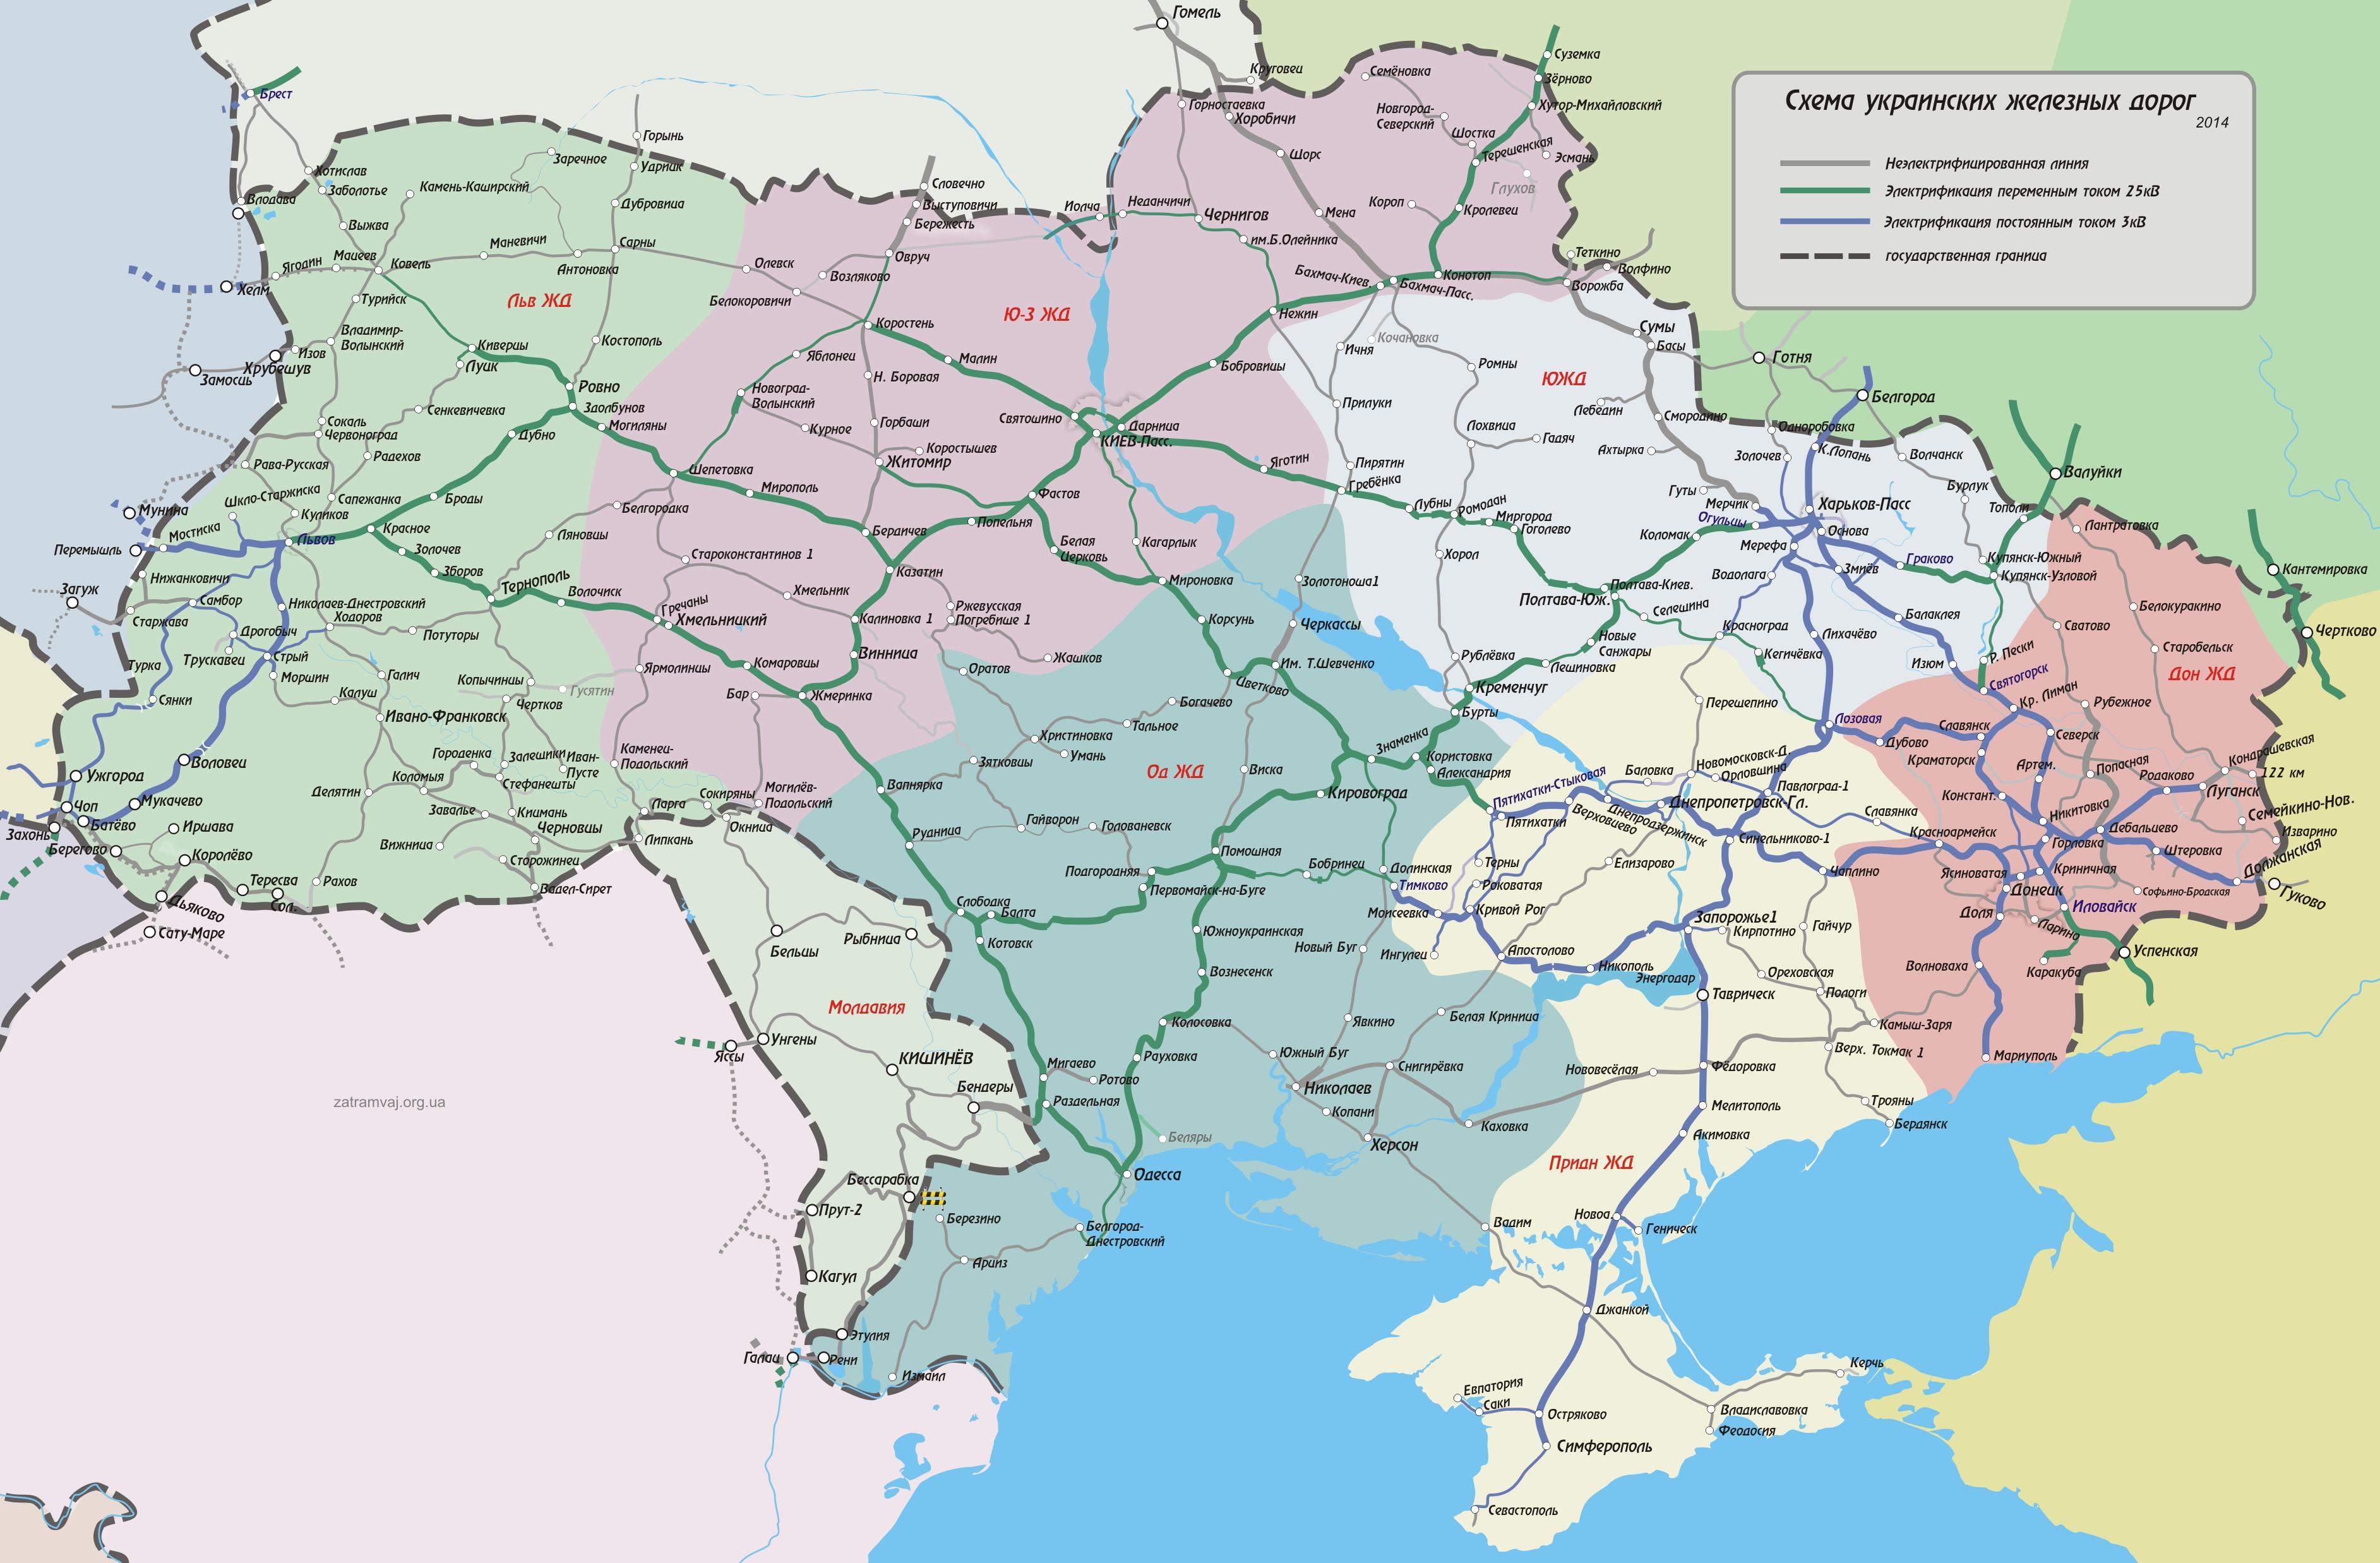 македония албания